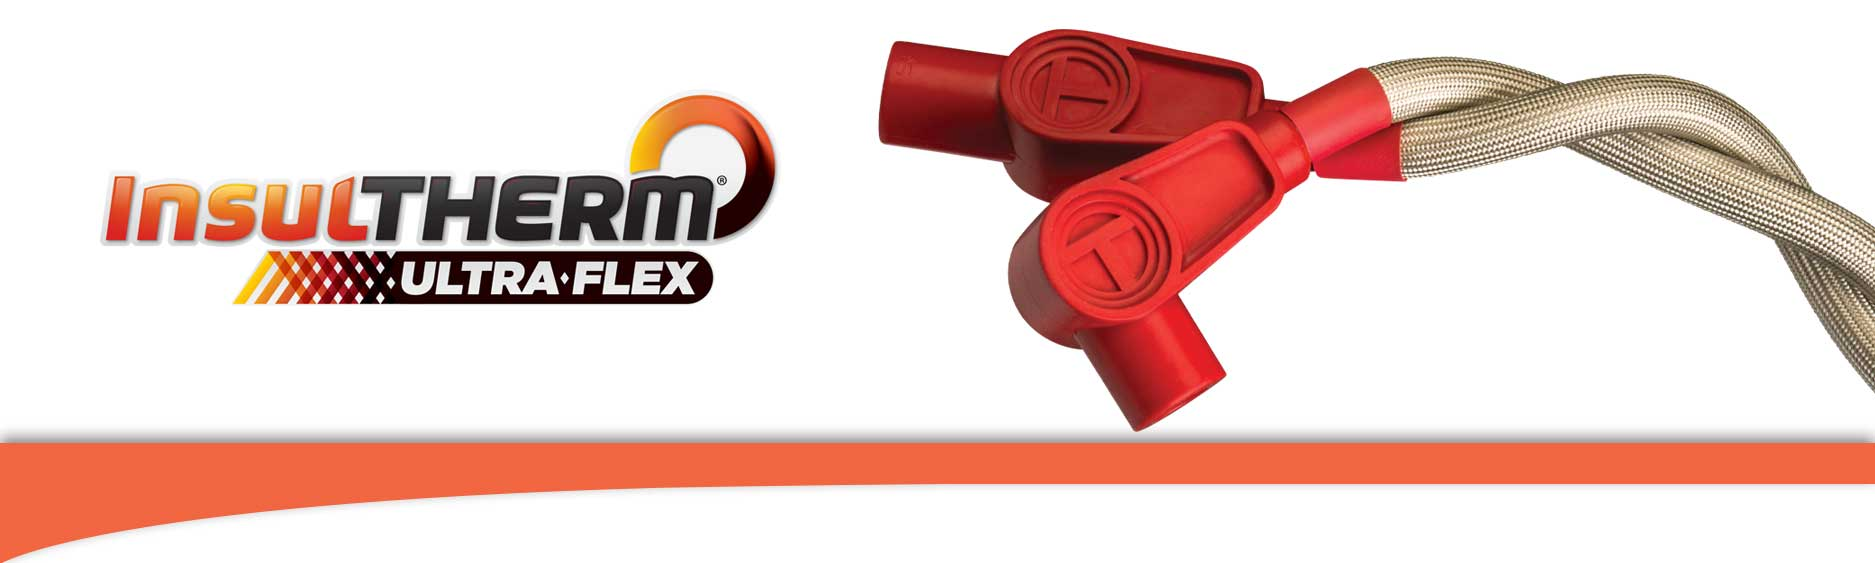 Insultherm    Ultraflexx